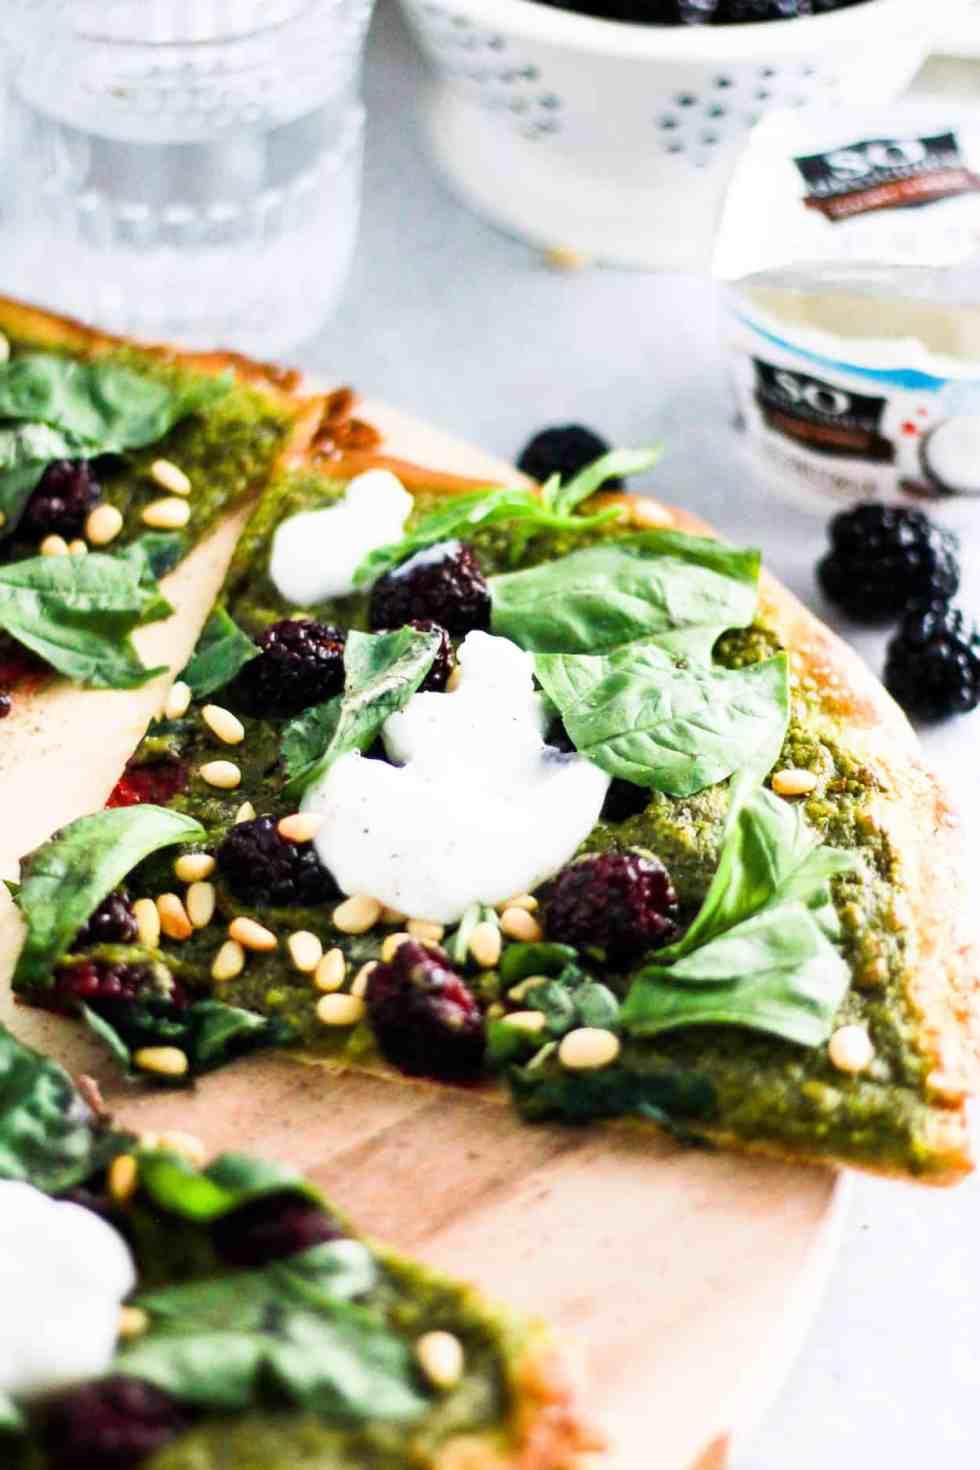 Sliced vegan pesto pizza with carton of So Delicious Coconut milk yogurt in the background.